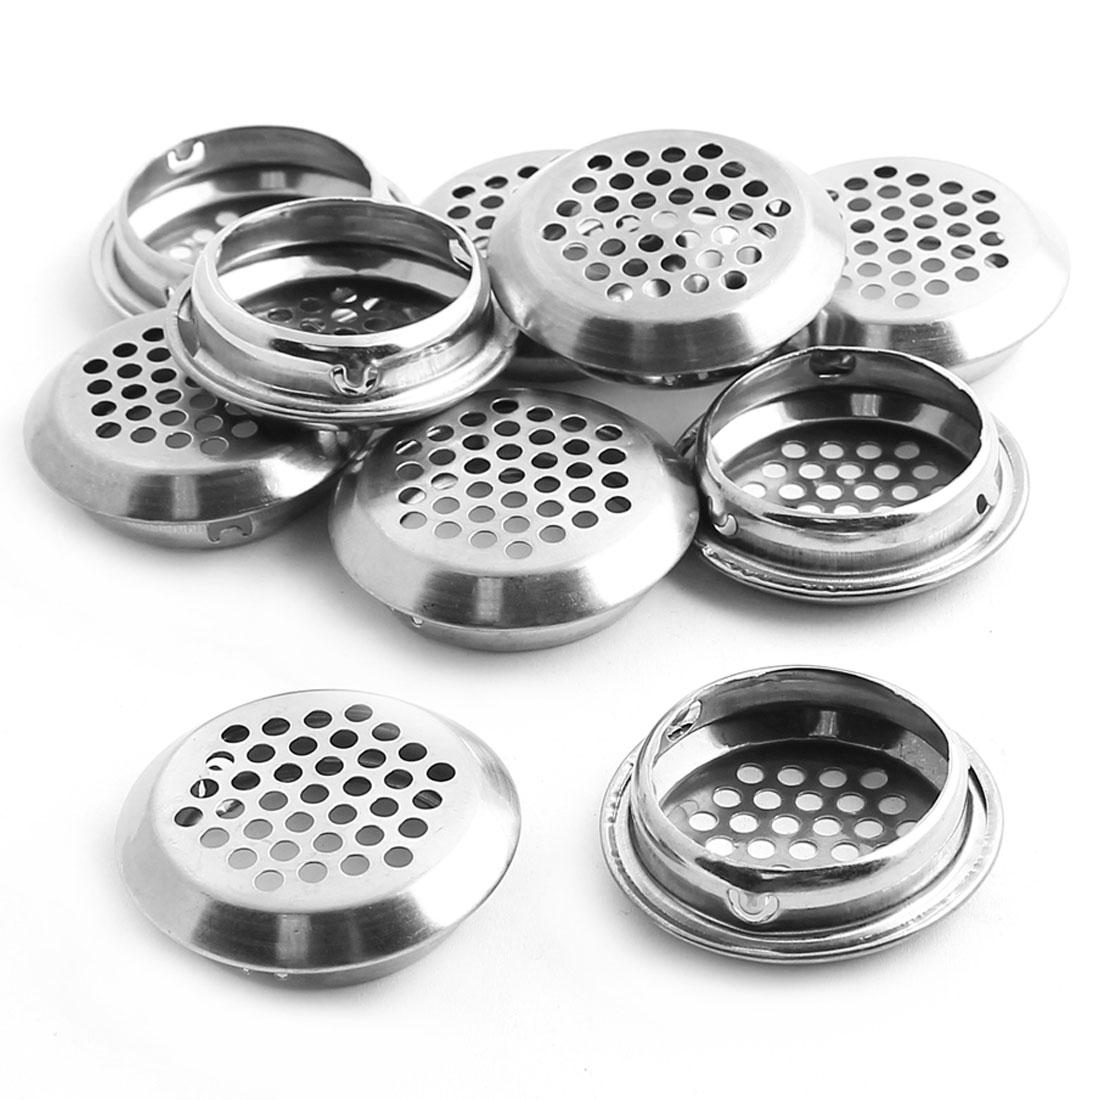 35mm Bottom Dia Metal Silver Tone Air Vent Louvred Holes Cover Ventilation 10PCS